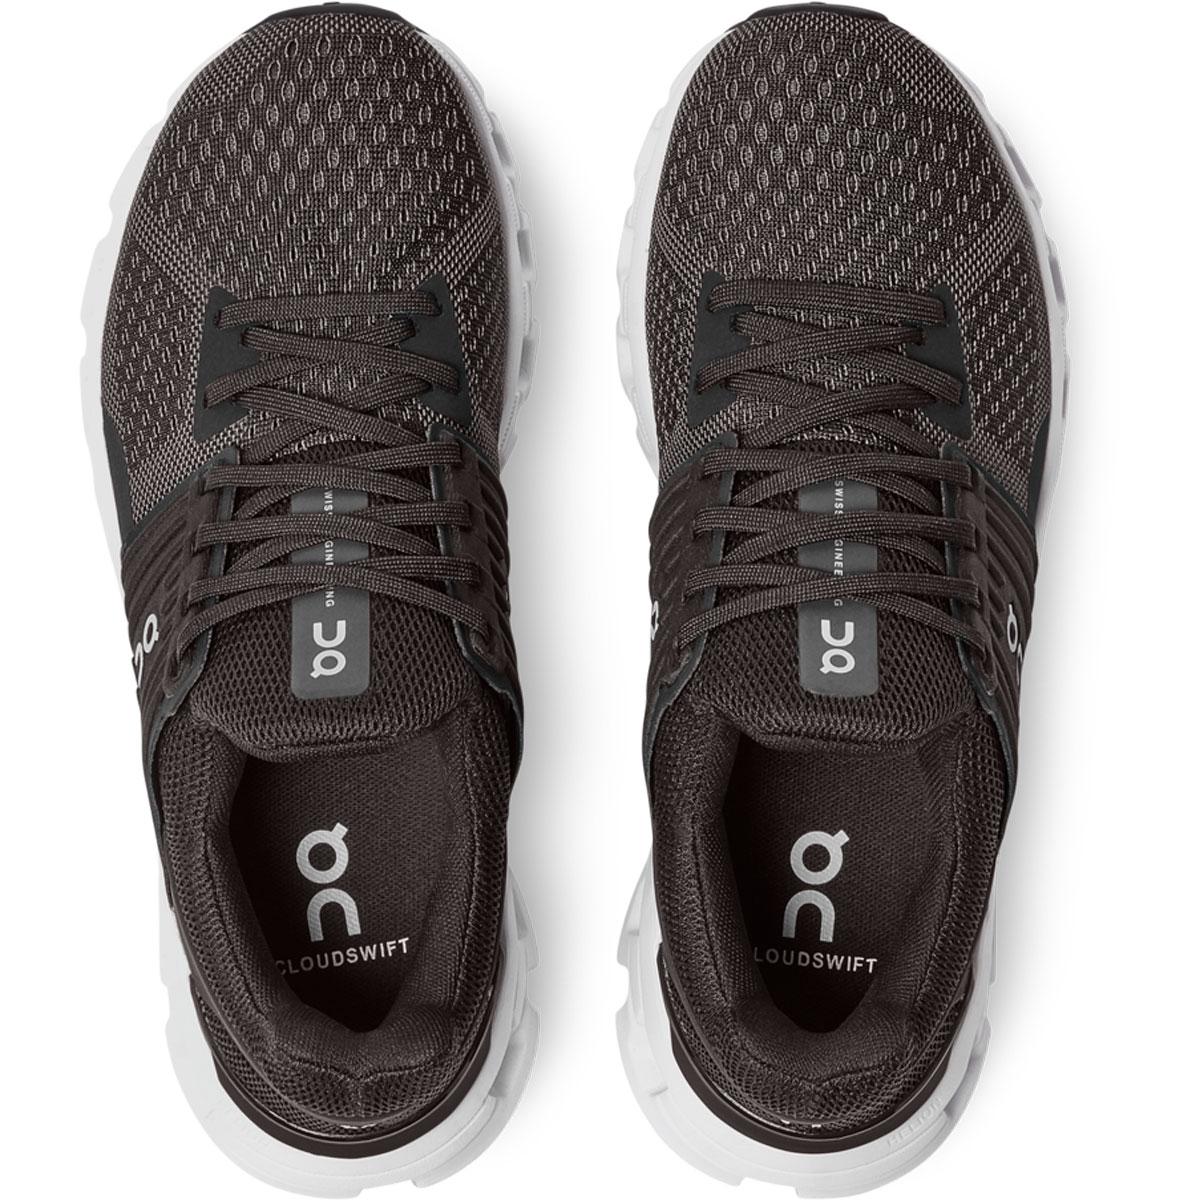 Women's On Cloudswift 2.0 Running Shoe - Color: Black/Rock - Size: 5 - Width: Regular, Black/Rock, large, image 4